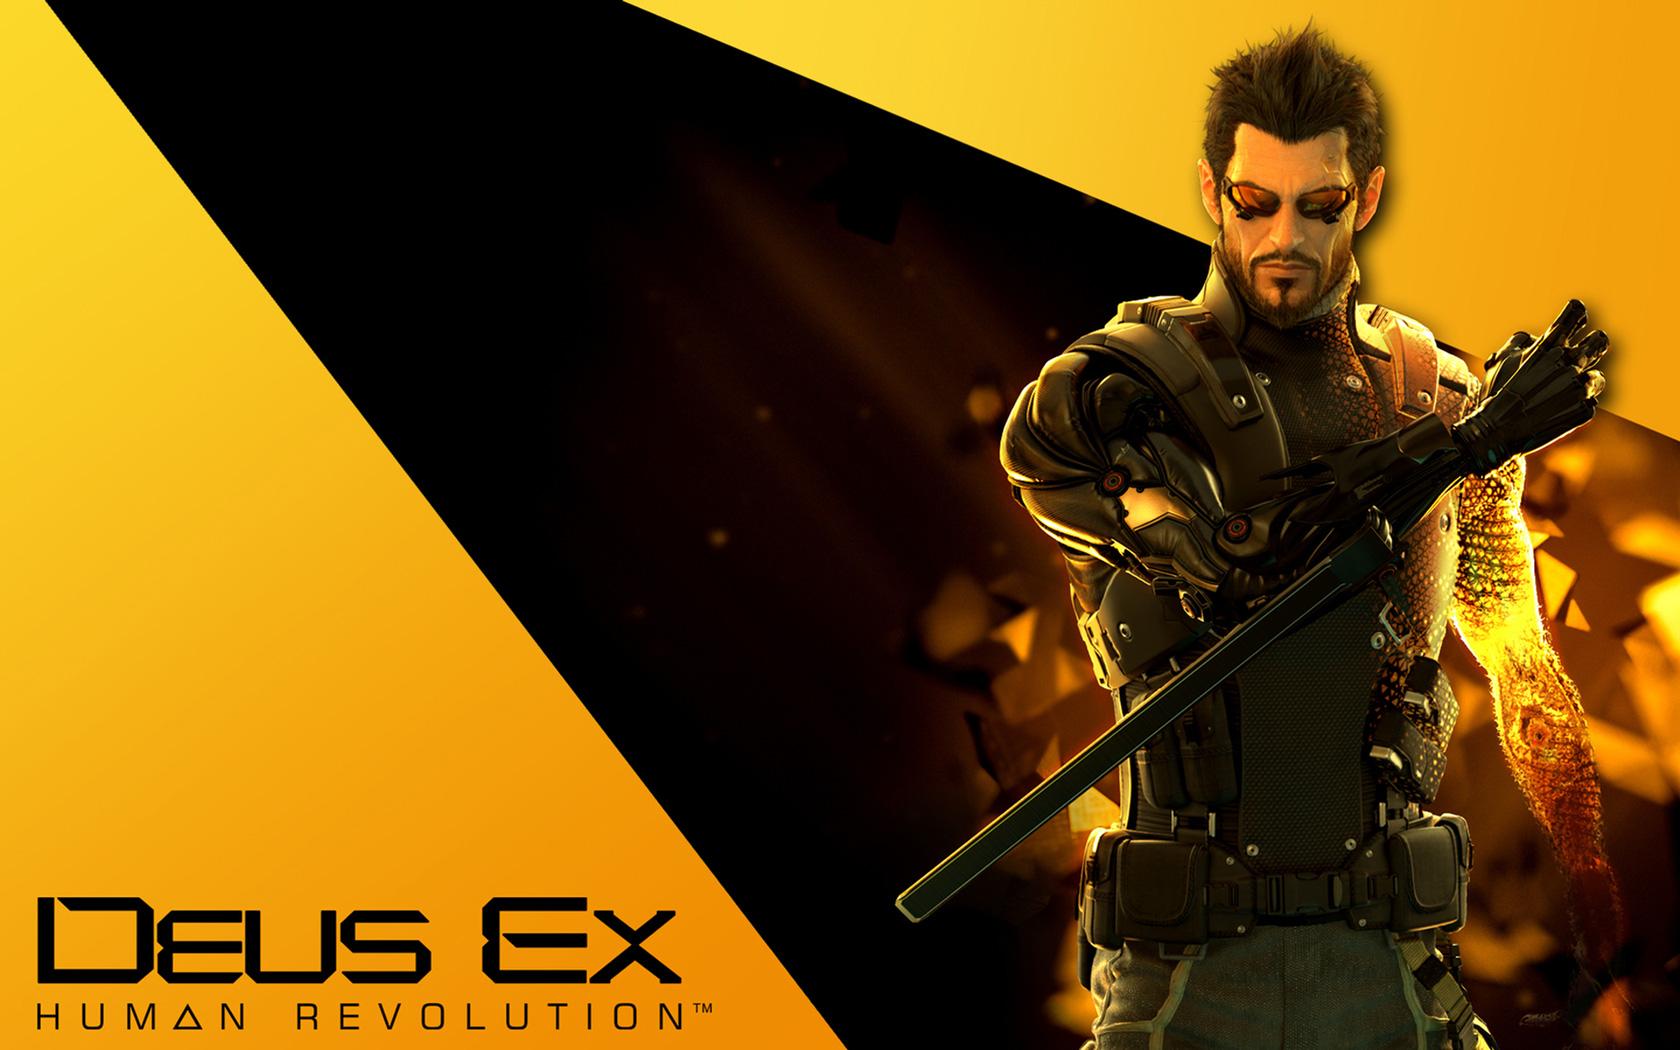 Deus Ex: Human Revolution Wallpaper in 1680x1050